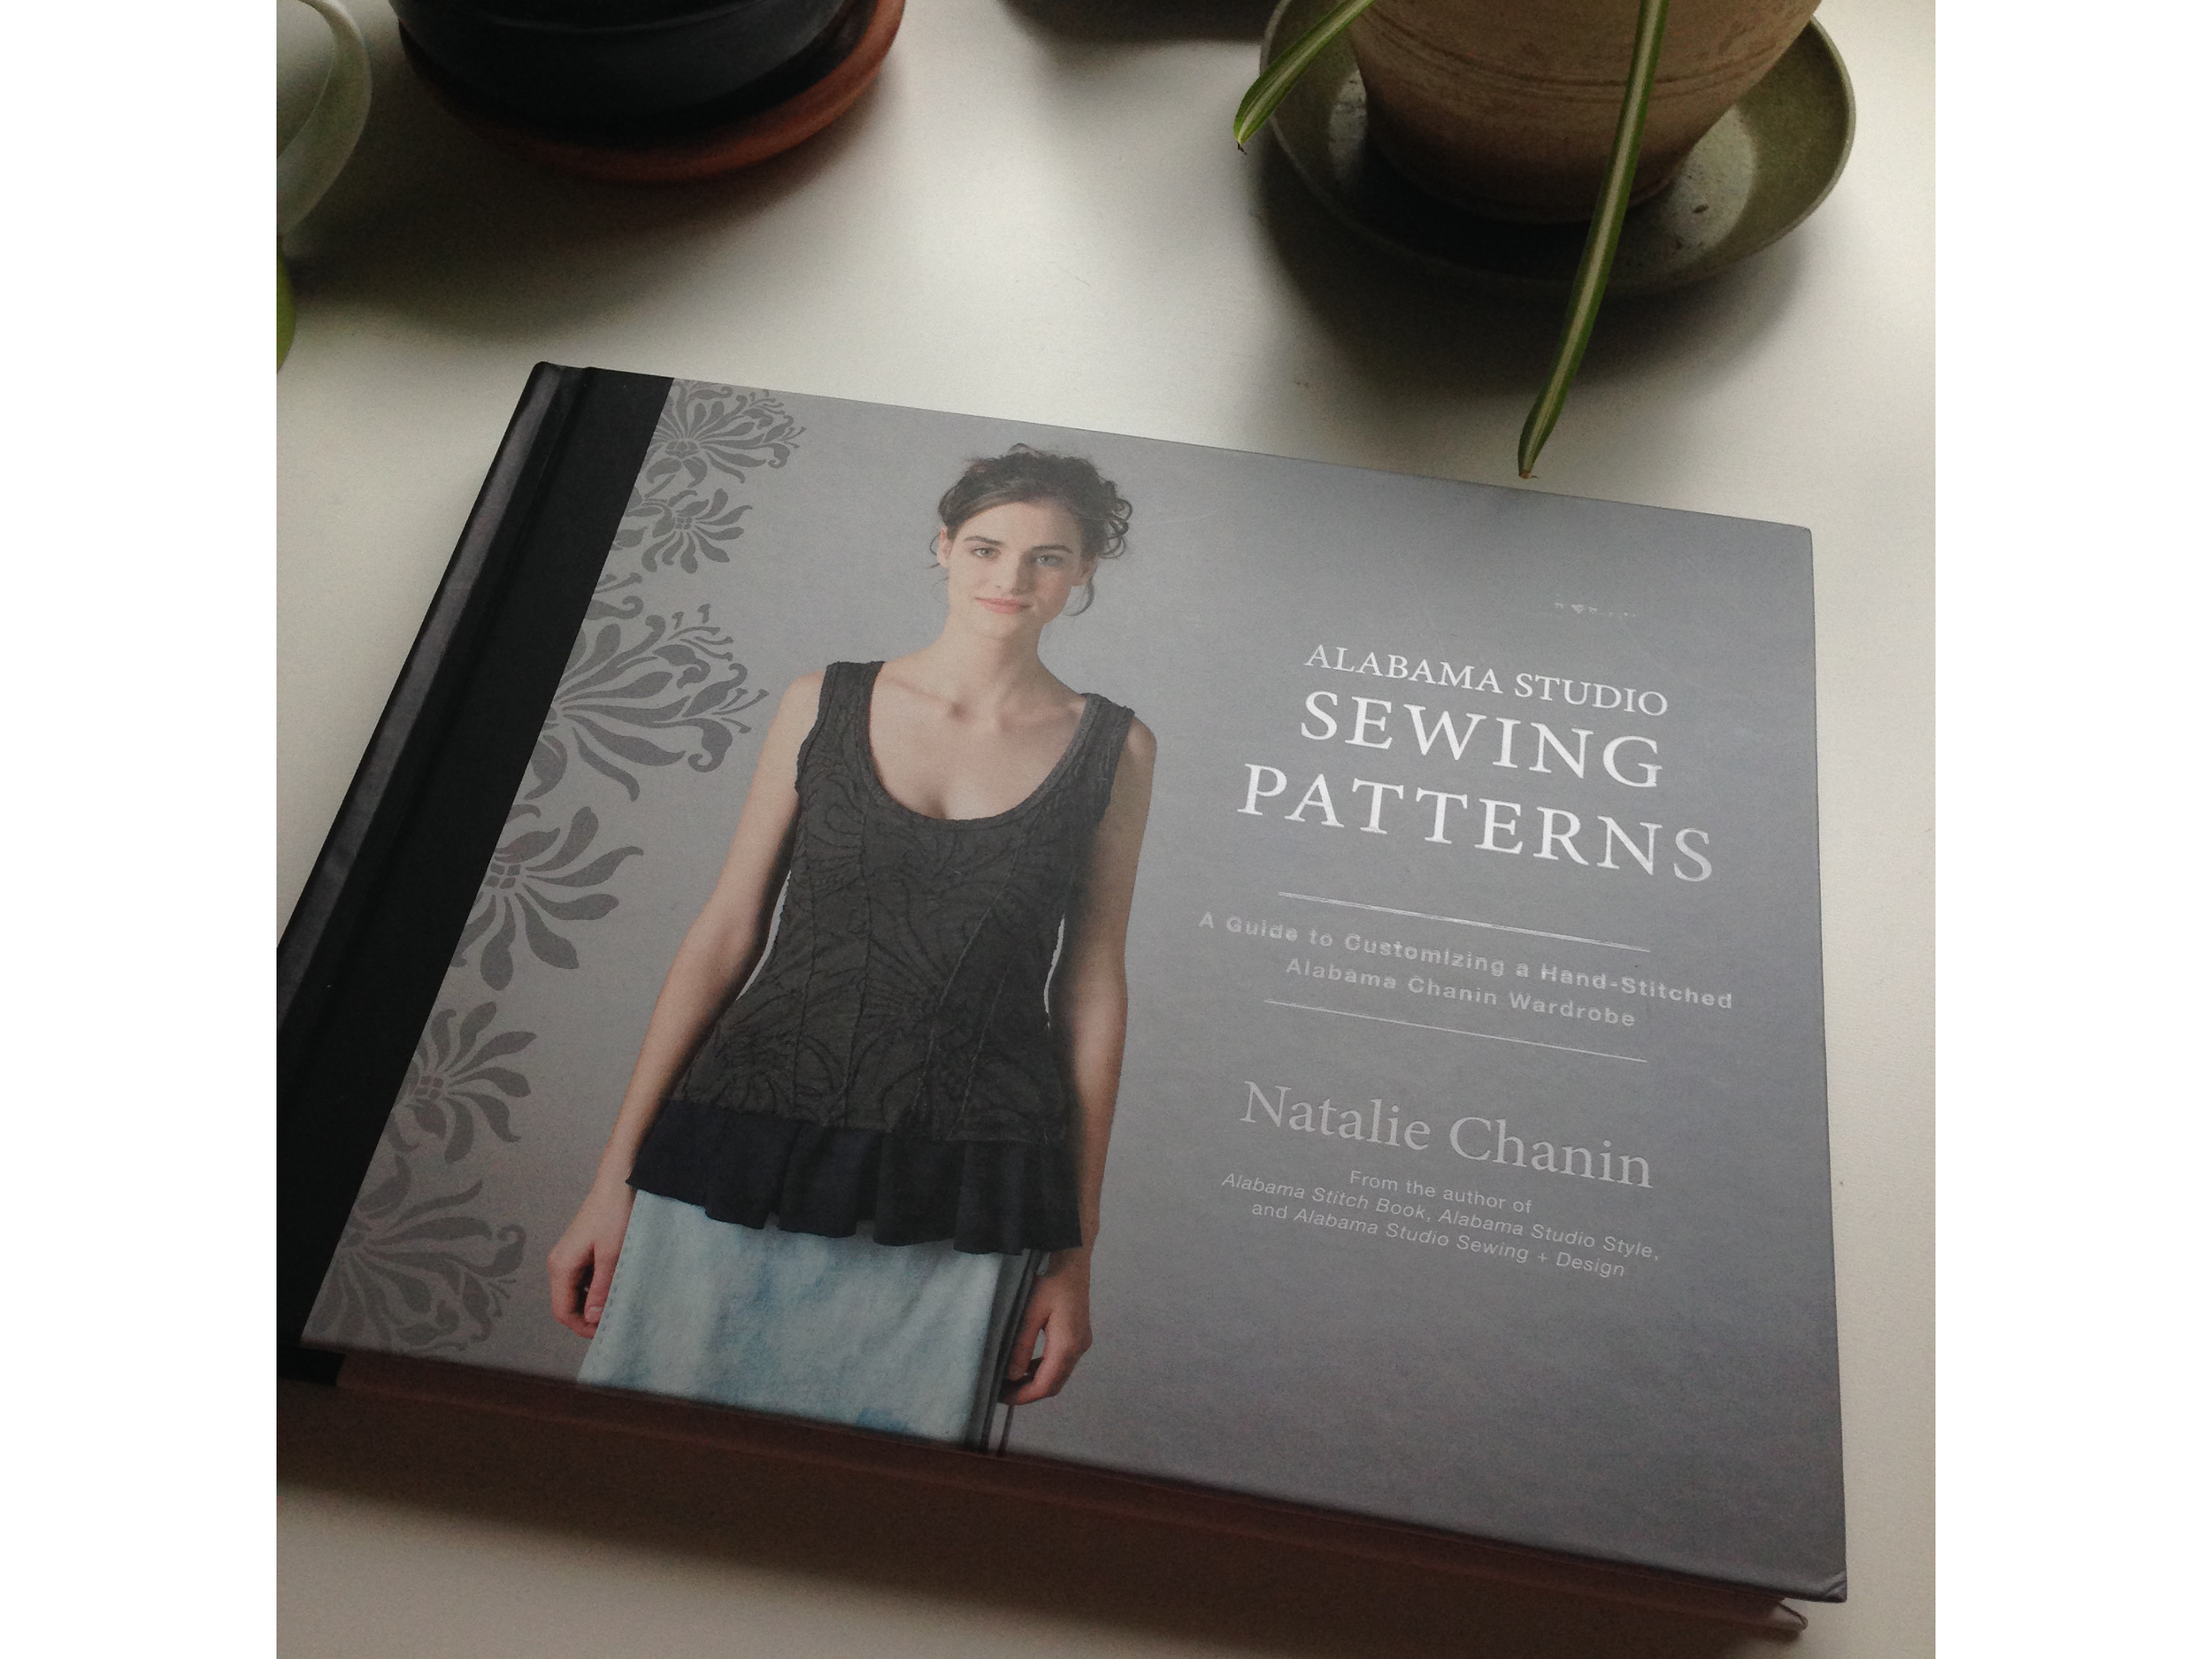 Alabama Studio Sewing Patterns Bolt Fabric Boutique Portland Oregon